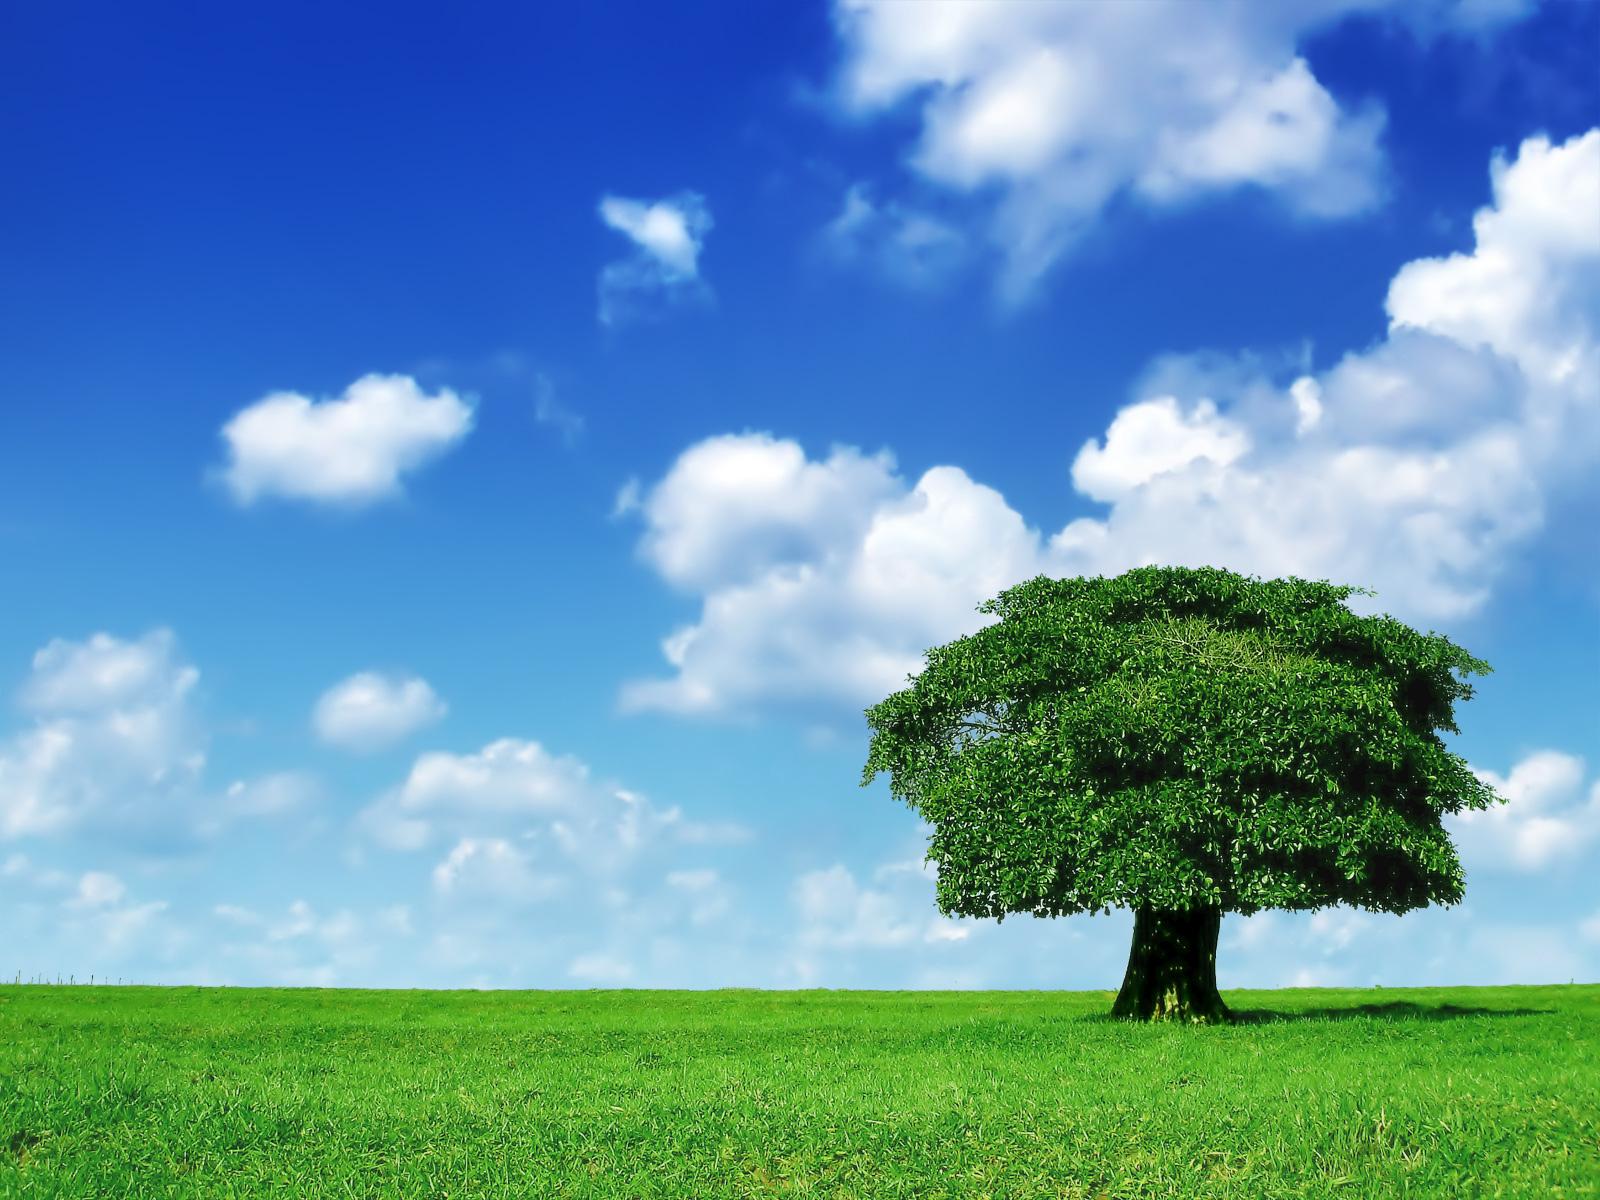 Beautiful Tree Wallpaper HD Freetopwallpapercom 1600x1200